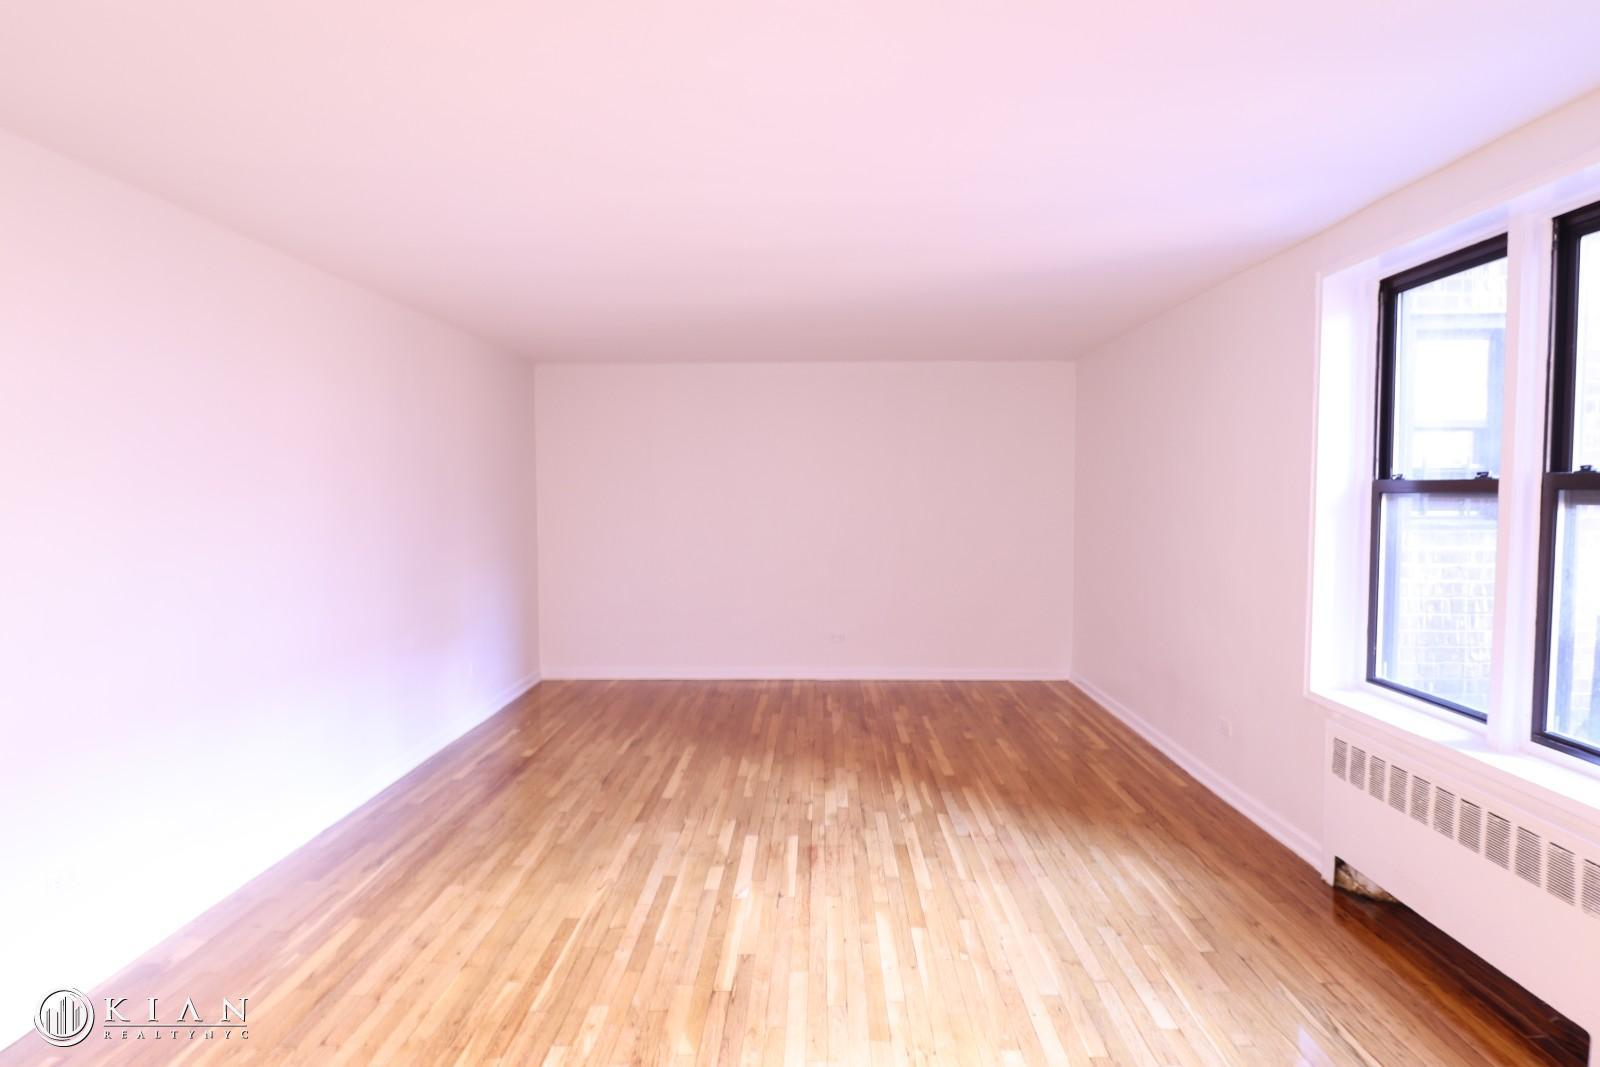 143-45 Sanford Avenue Interior Photo